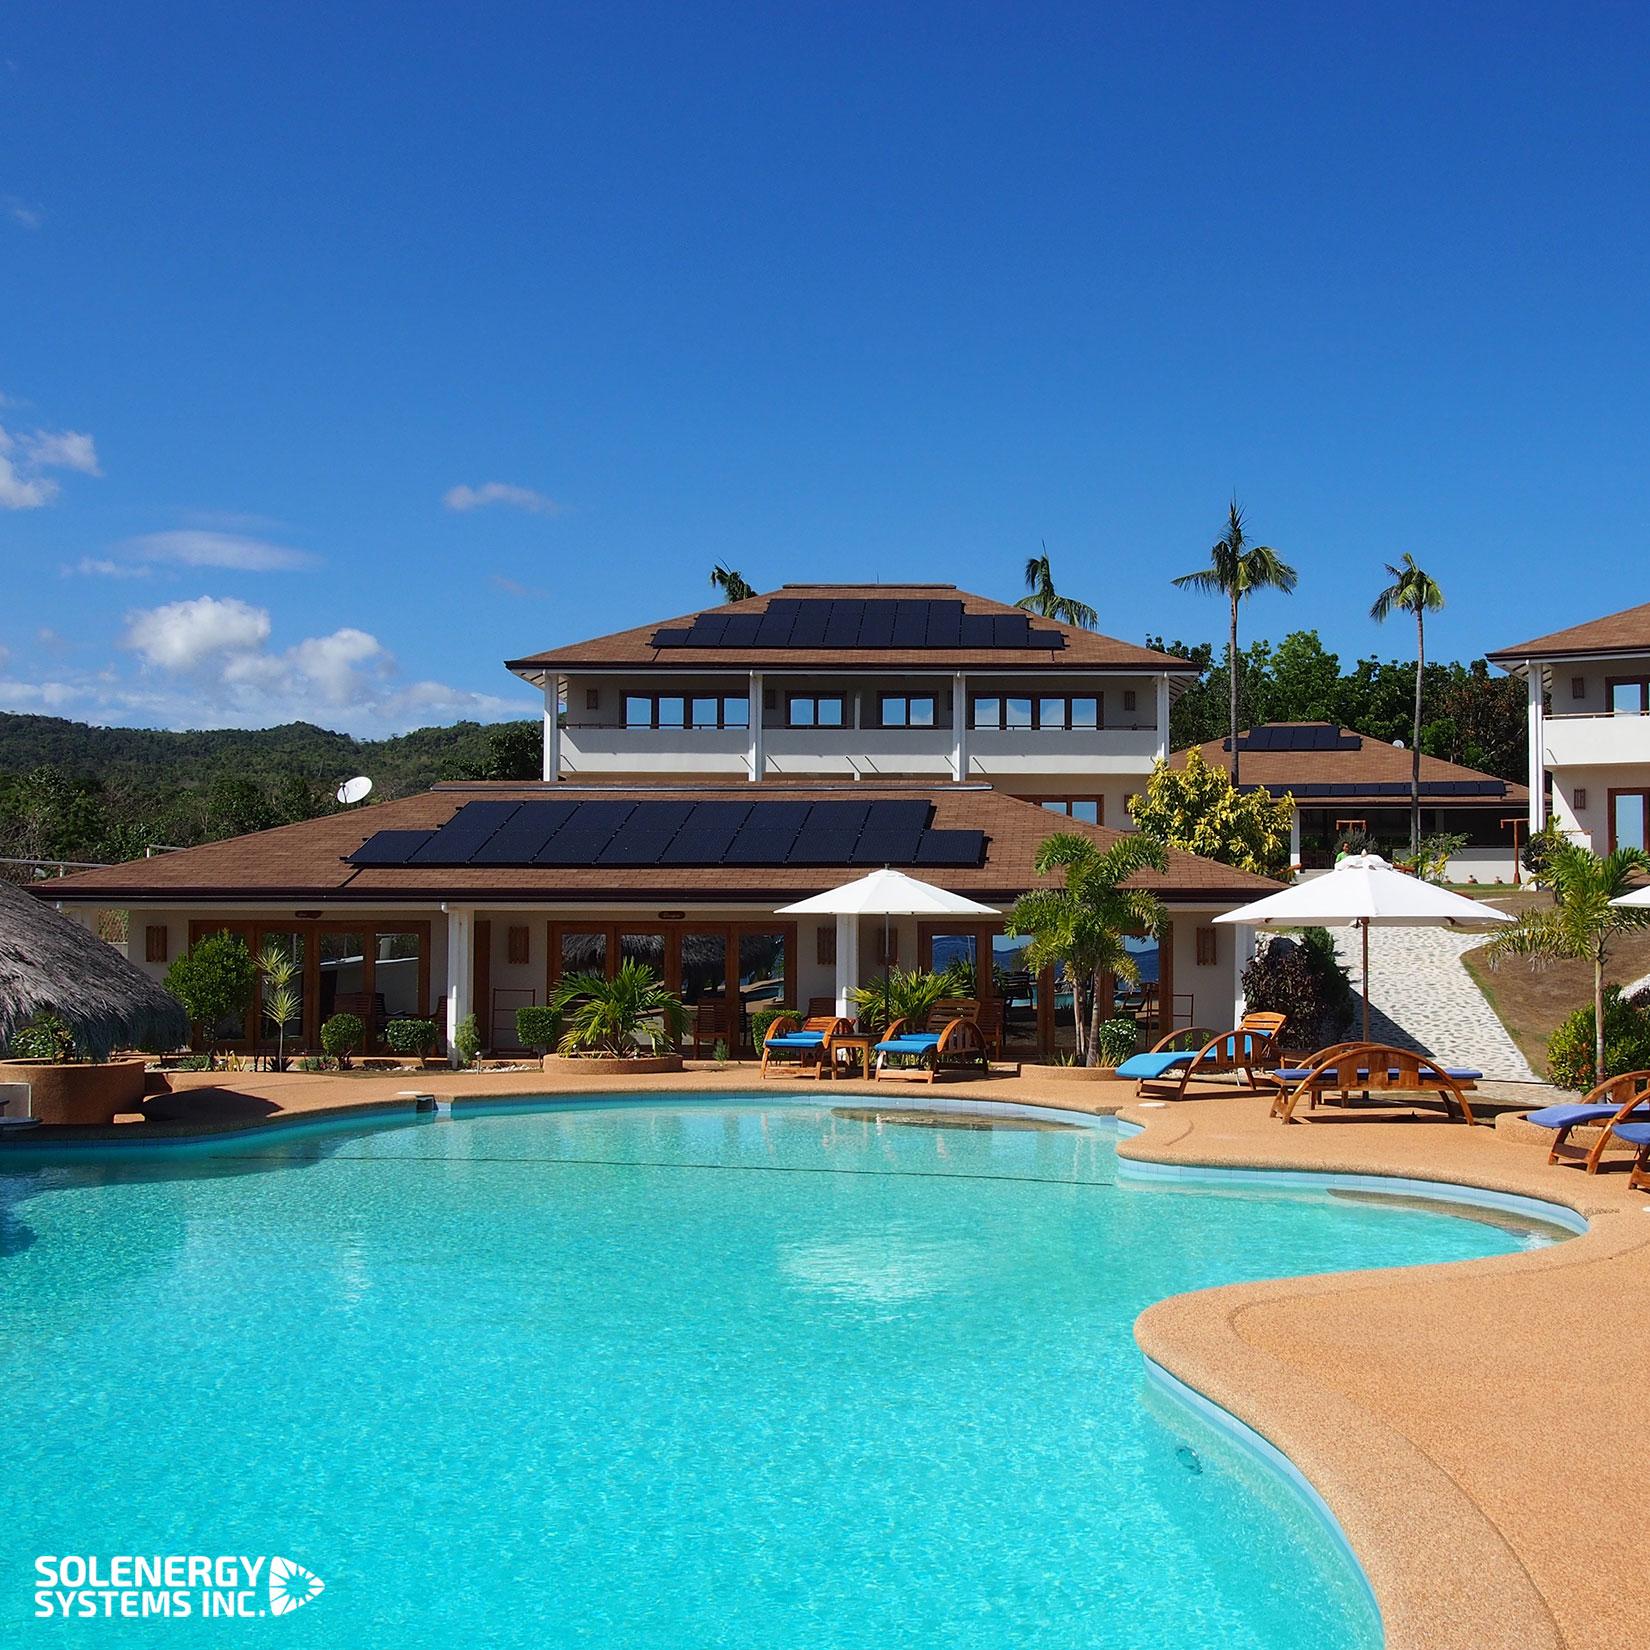 Salamangka-Beach-Resort-Solenergy